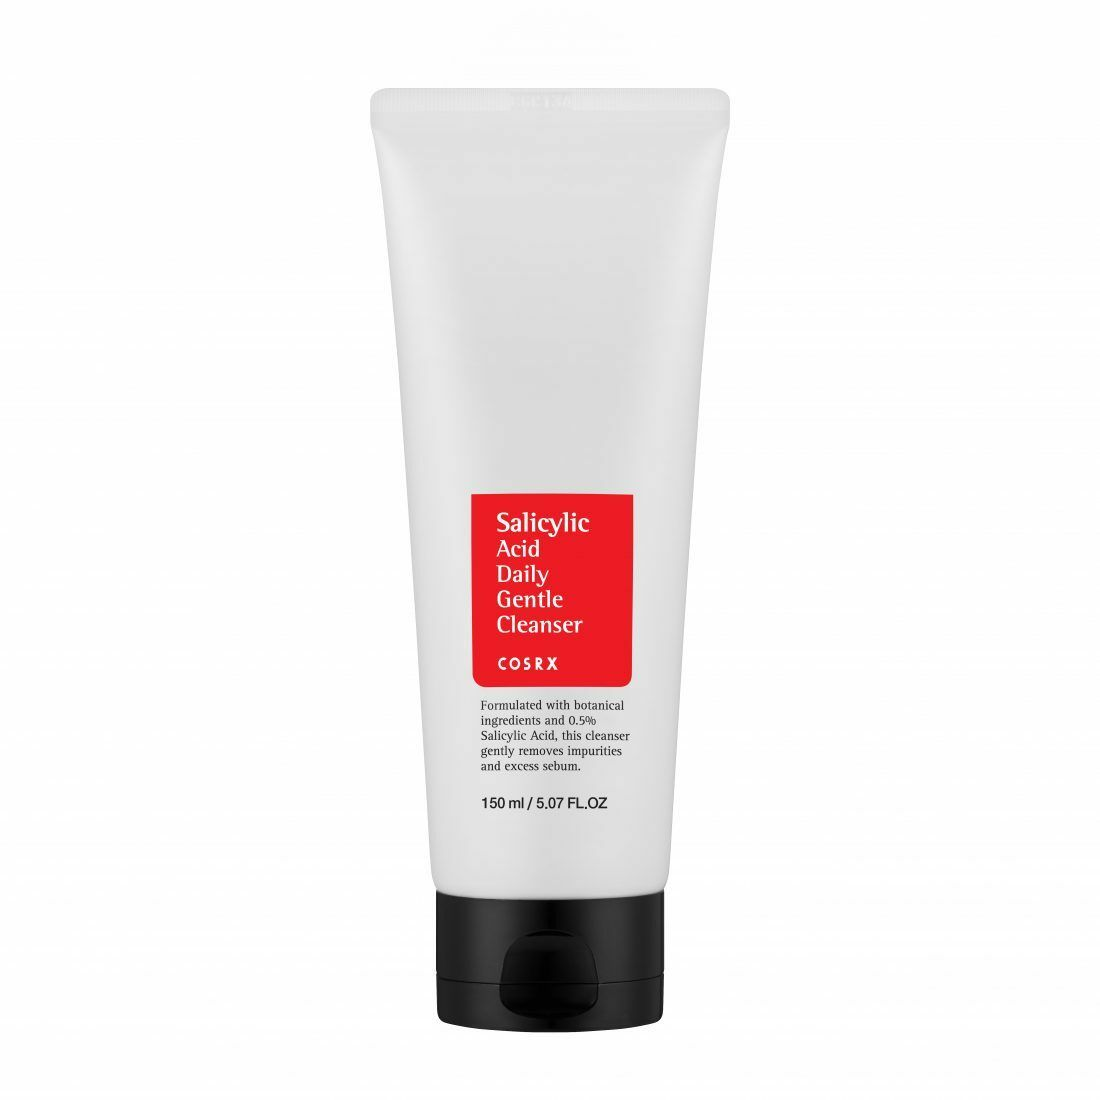 COSRX Salicylic Acid Daily Gentle Cleanser 150ml Facial Cleansing Exfoliating Peeling Deep Clean Acne Blackhead Remove Korean